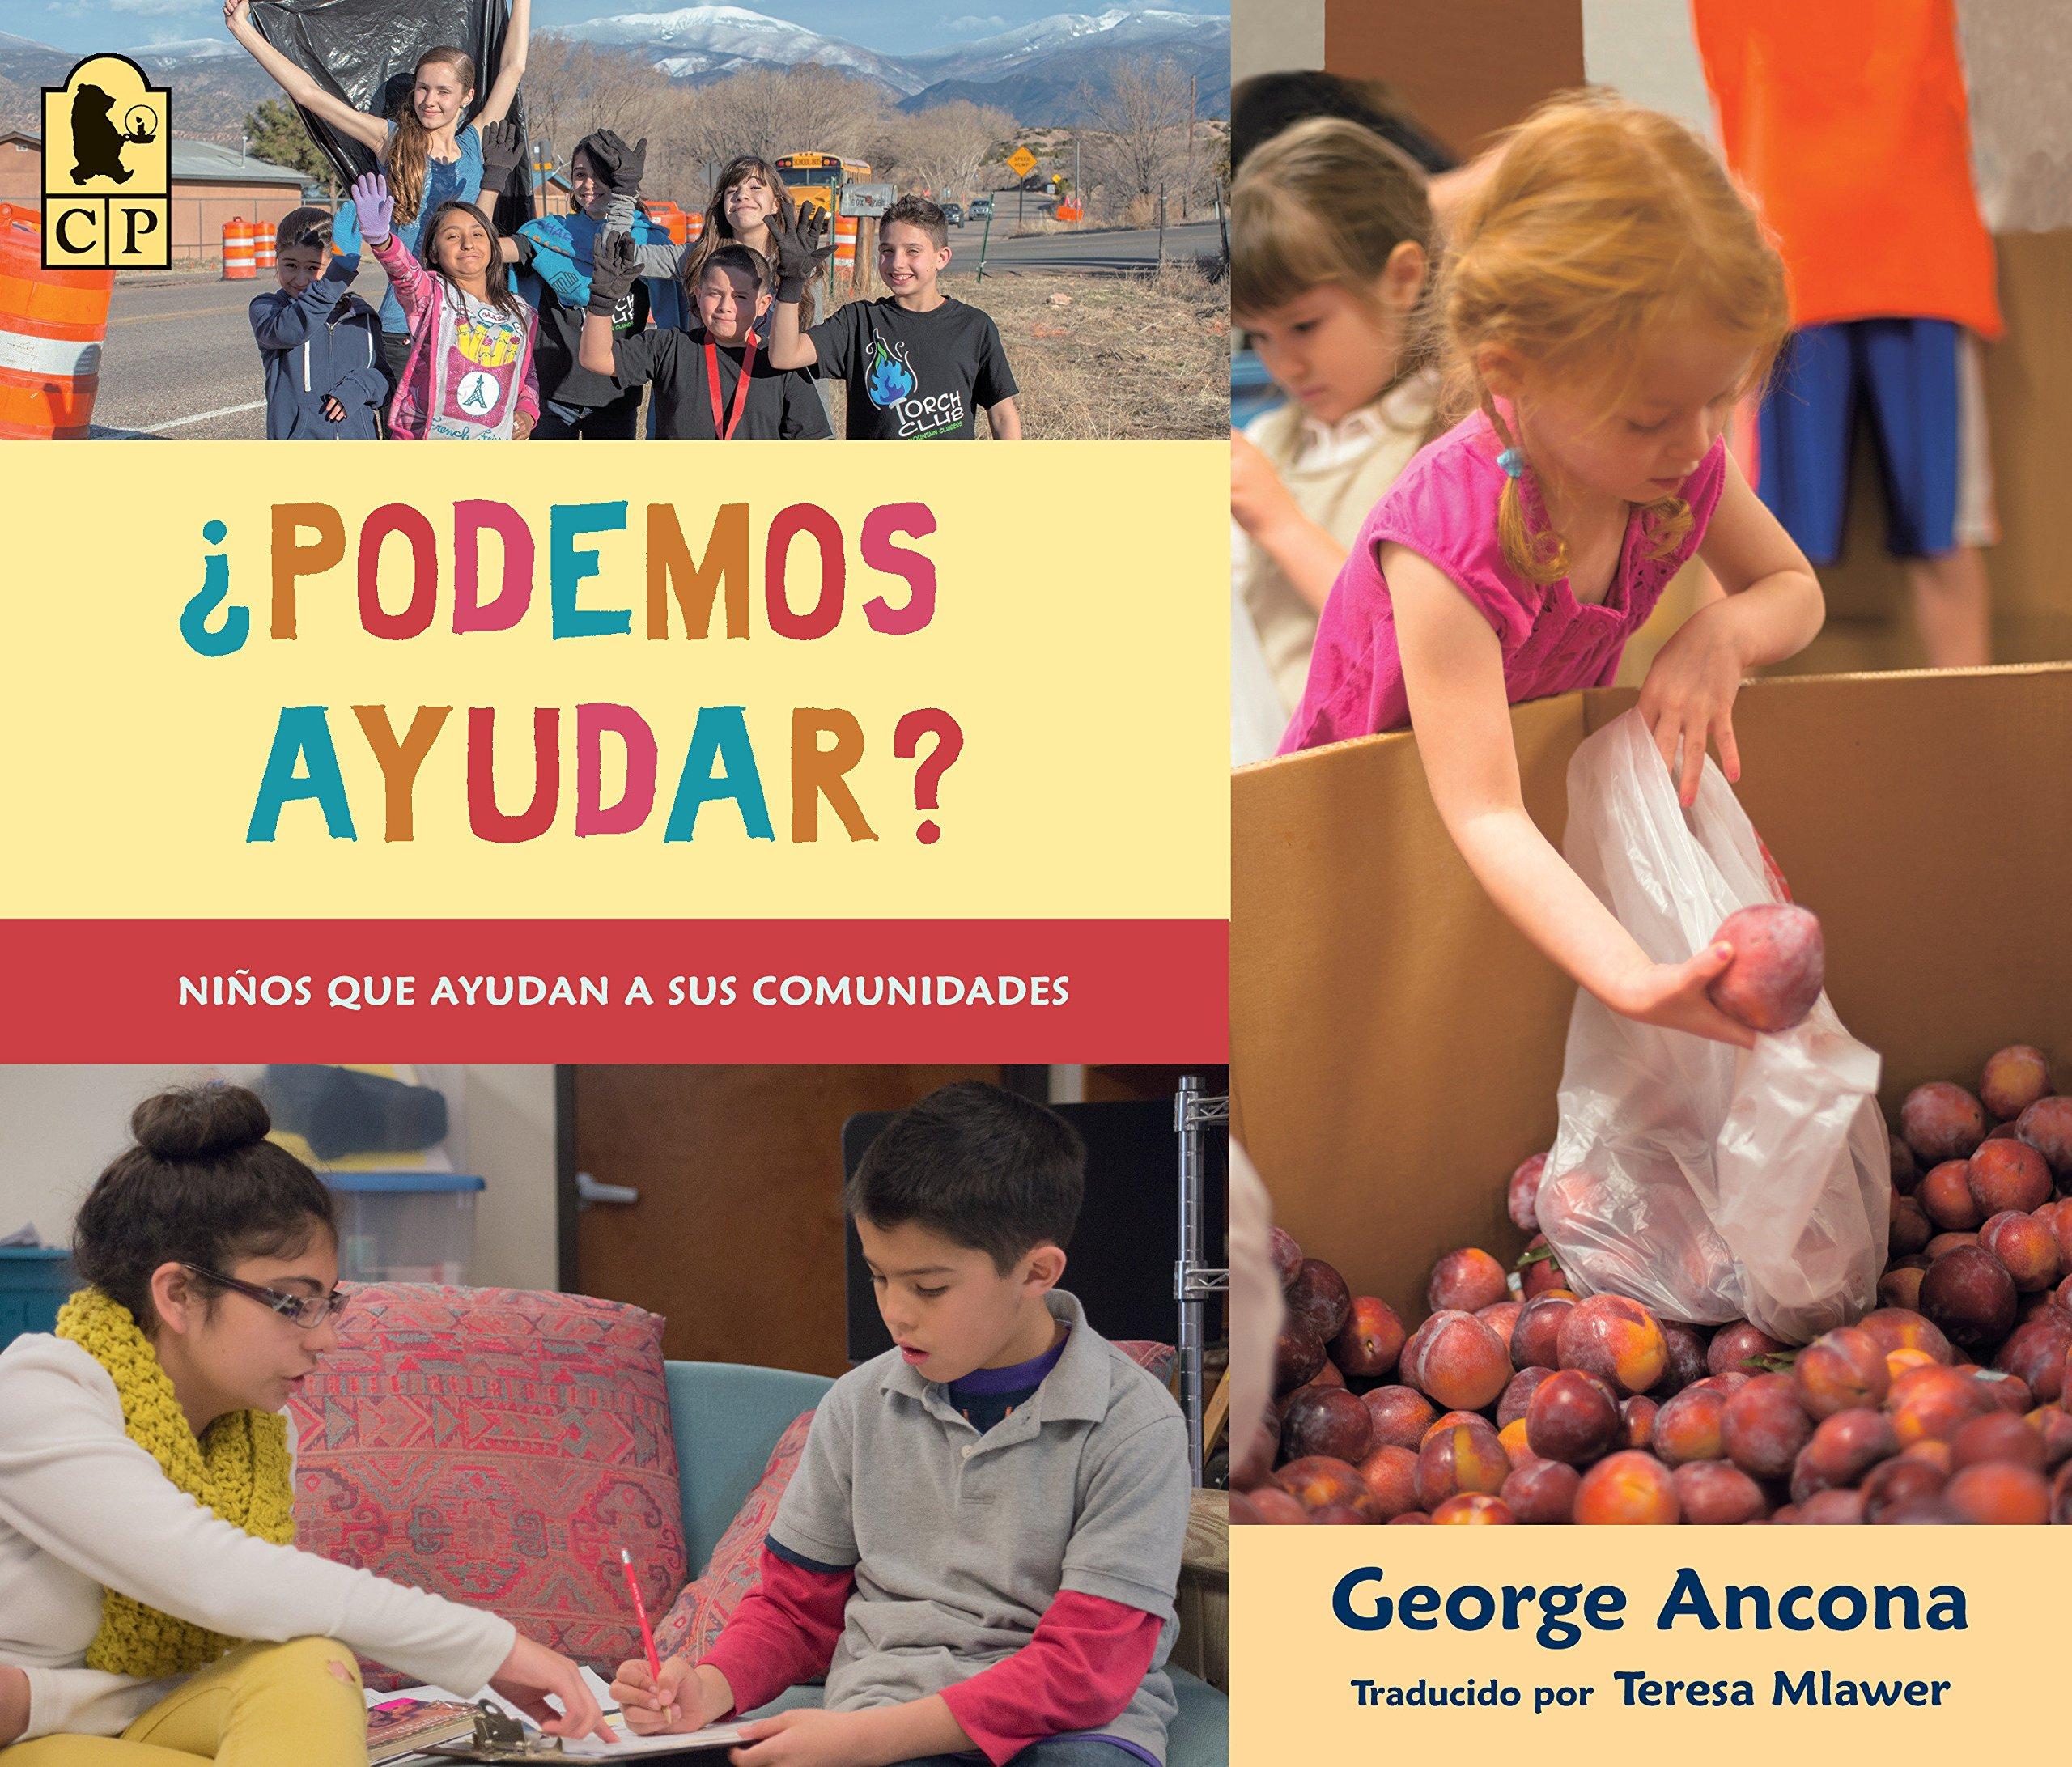 ¿Podemos ayudar?: Niños que ayudan a sus comunidades (Spanish Edition) (Spanish) Paperback – February 12, 2019